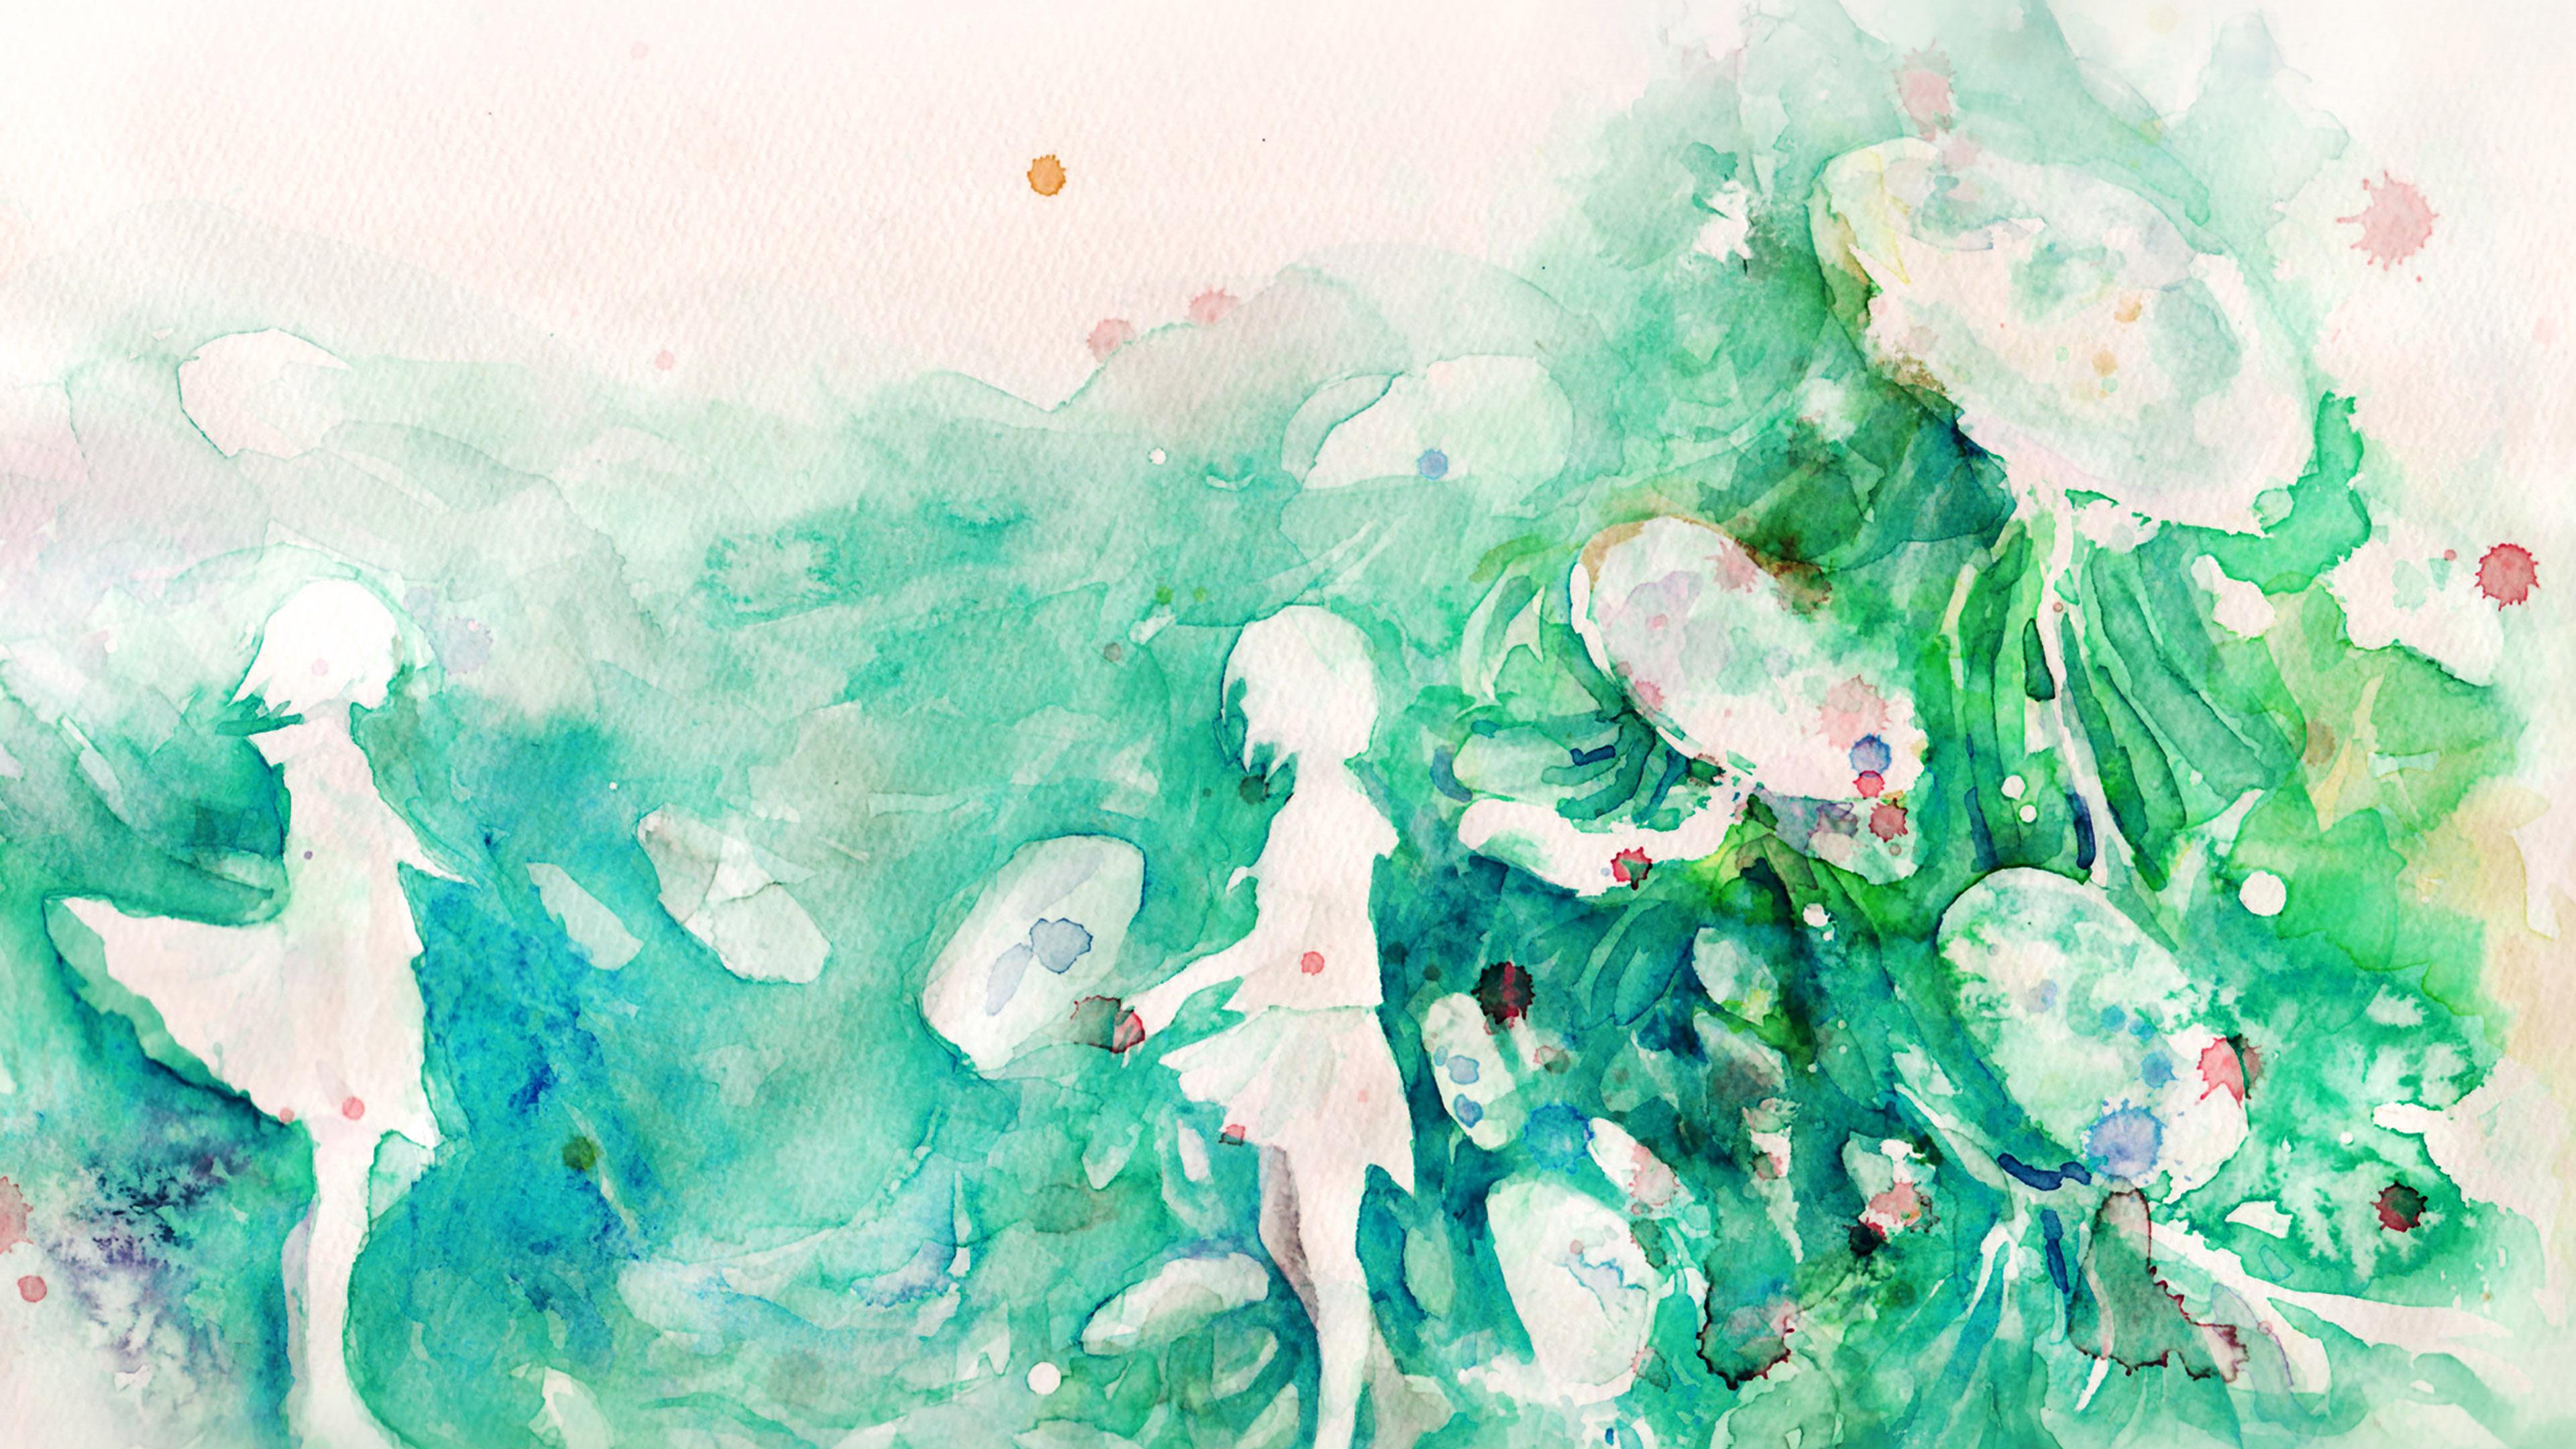 Small Cute Girl Wallpaper Ai07 Watercolor Green Girl Nature Art Illust Wallpaper